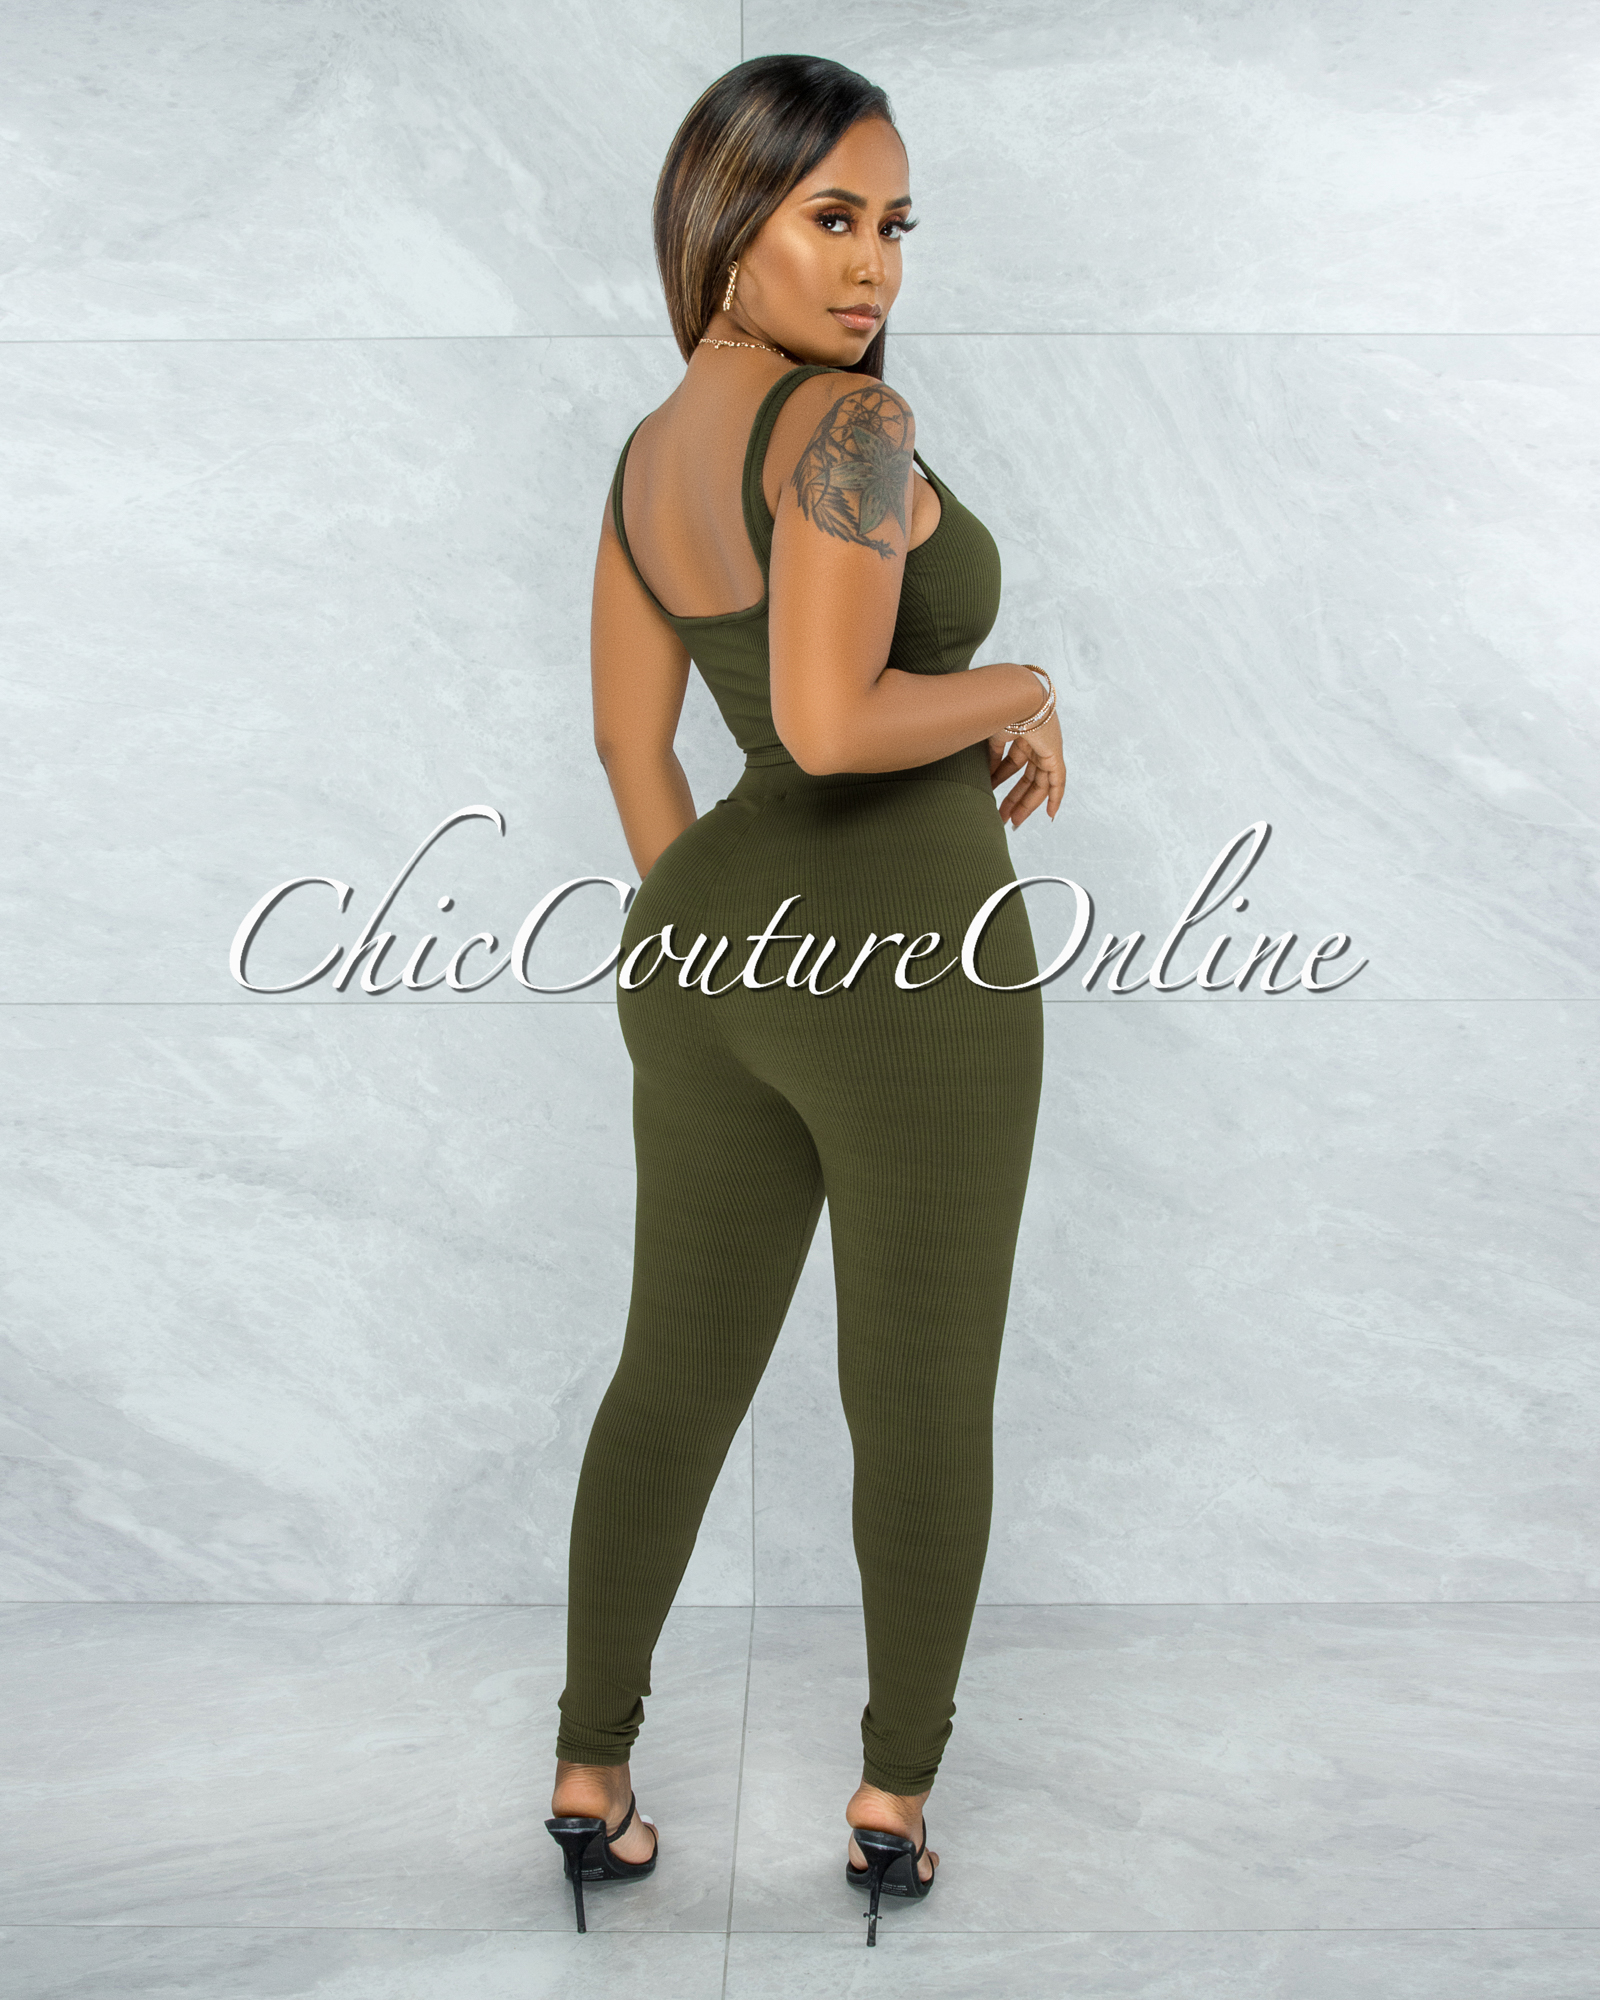 Shabnan Olive Black Zipper Top & Leggings Ribbed Set